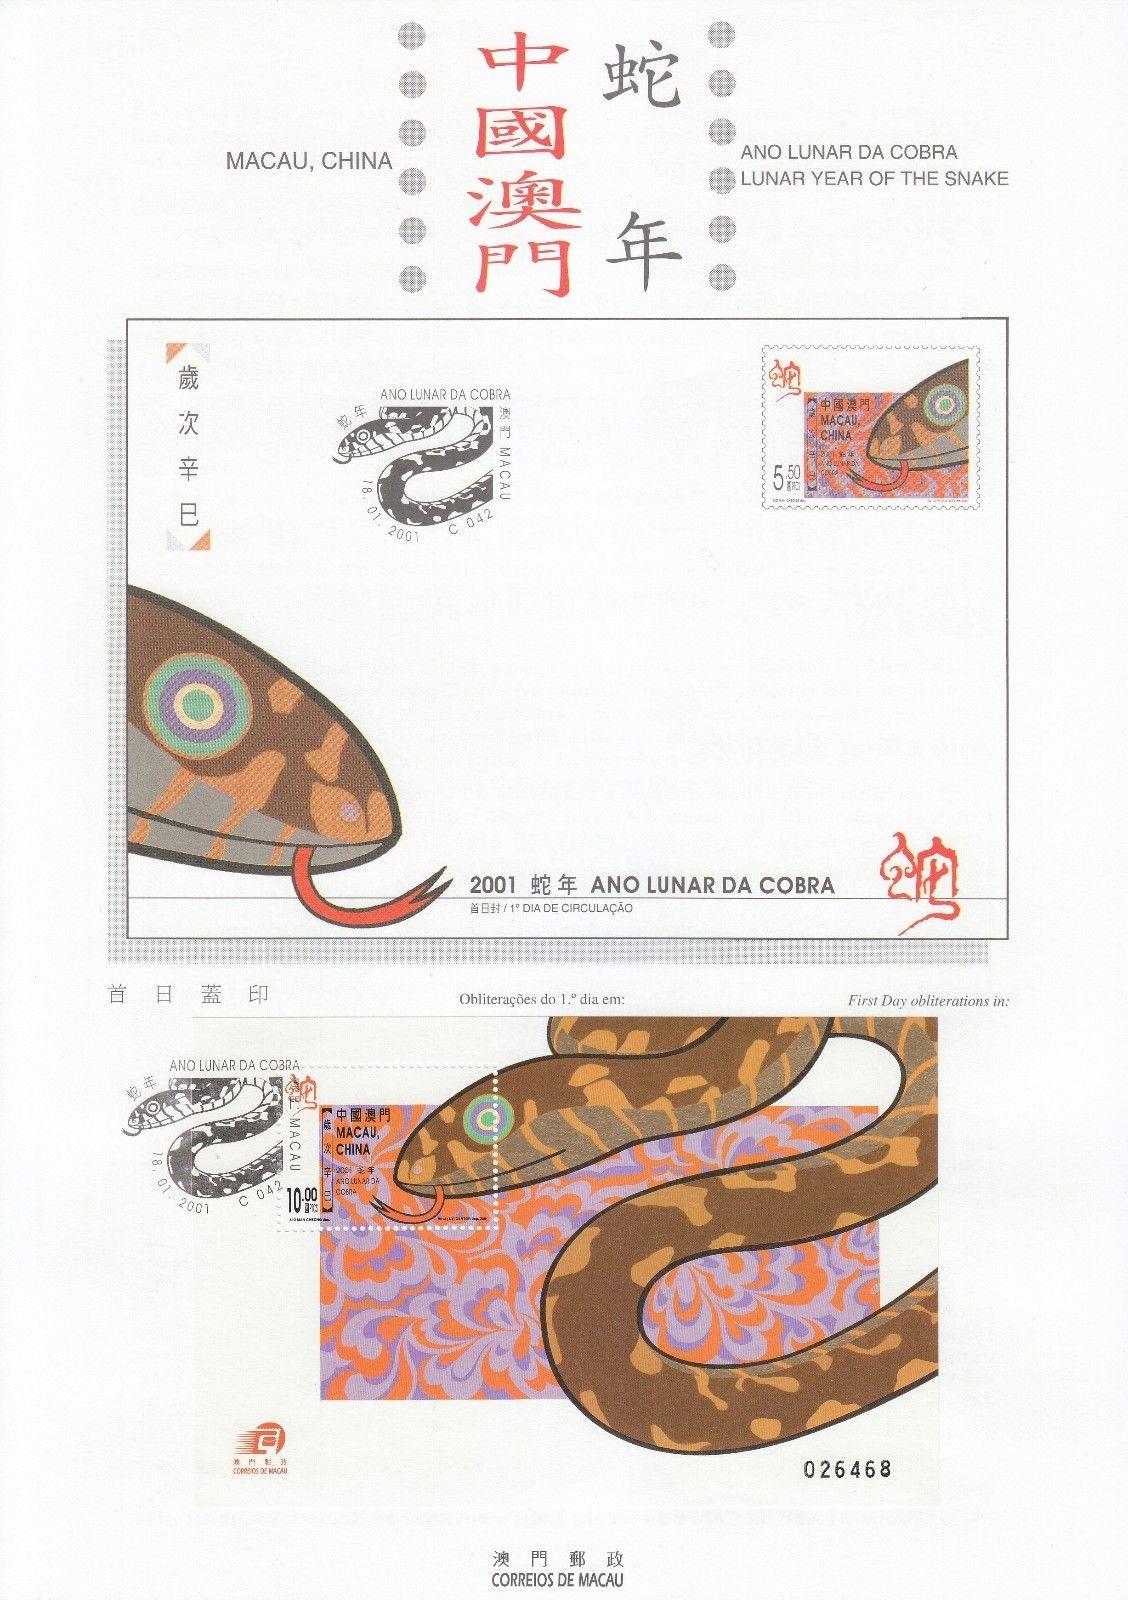 Macao 2001 Year of the Snake IOPb.jpg